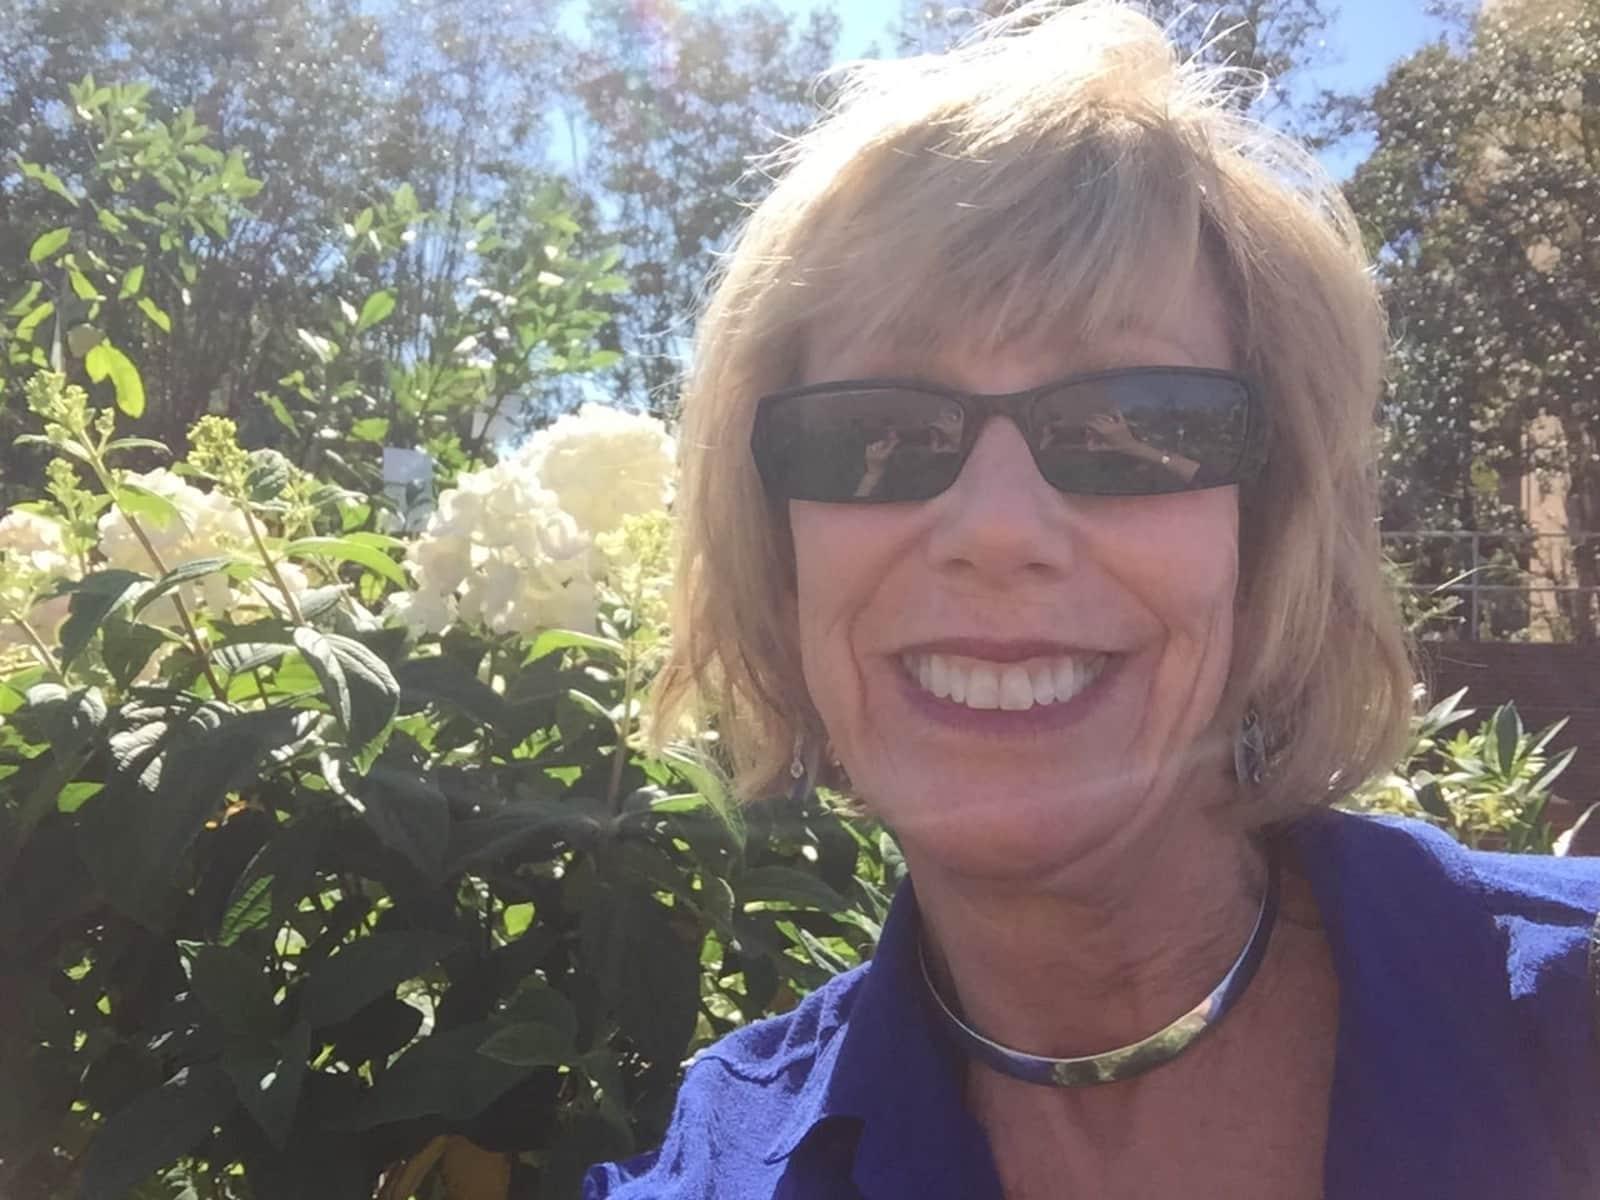 Sybil from Rock Hill, South Carolina, United States